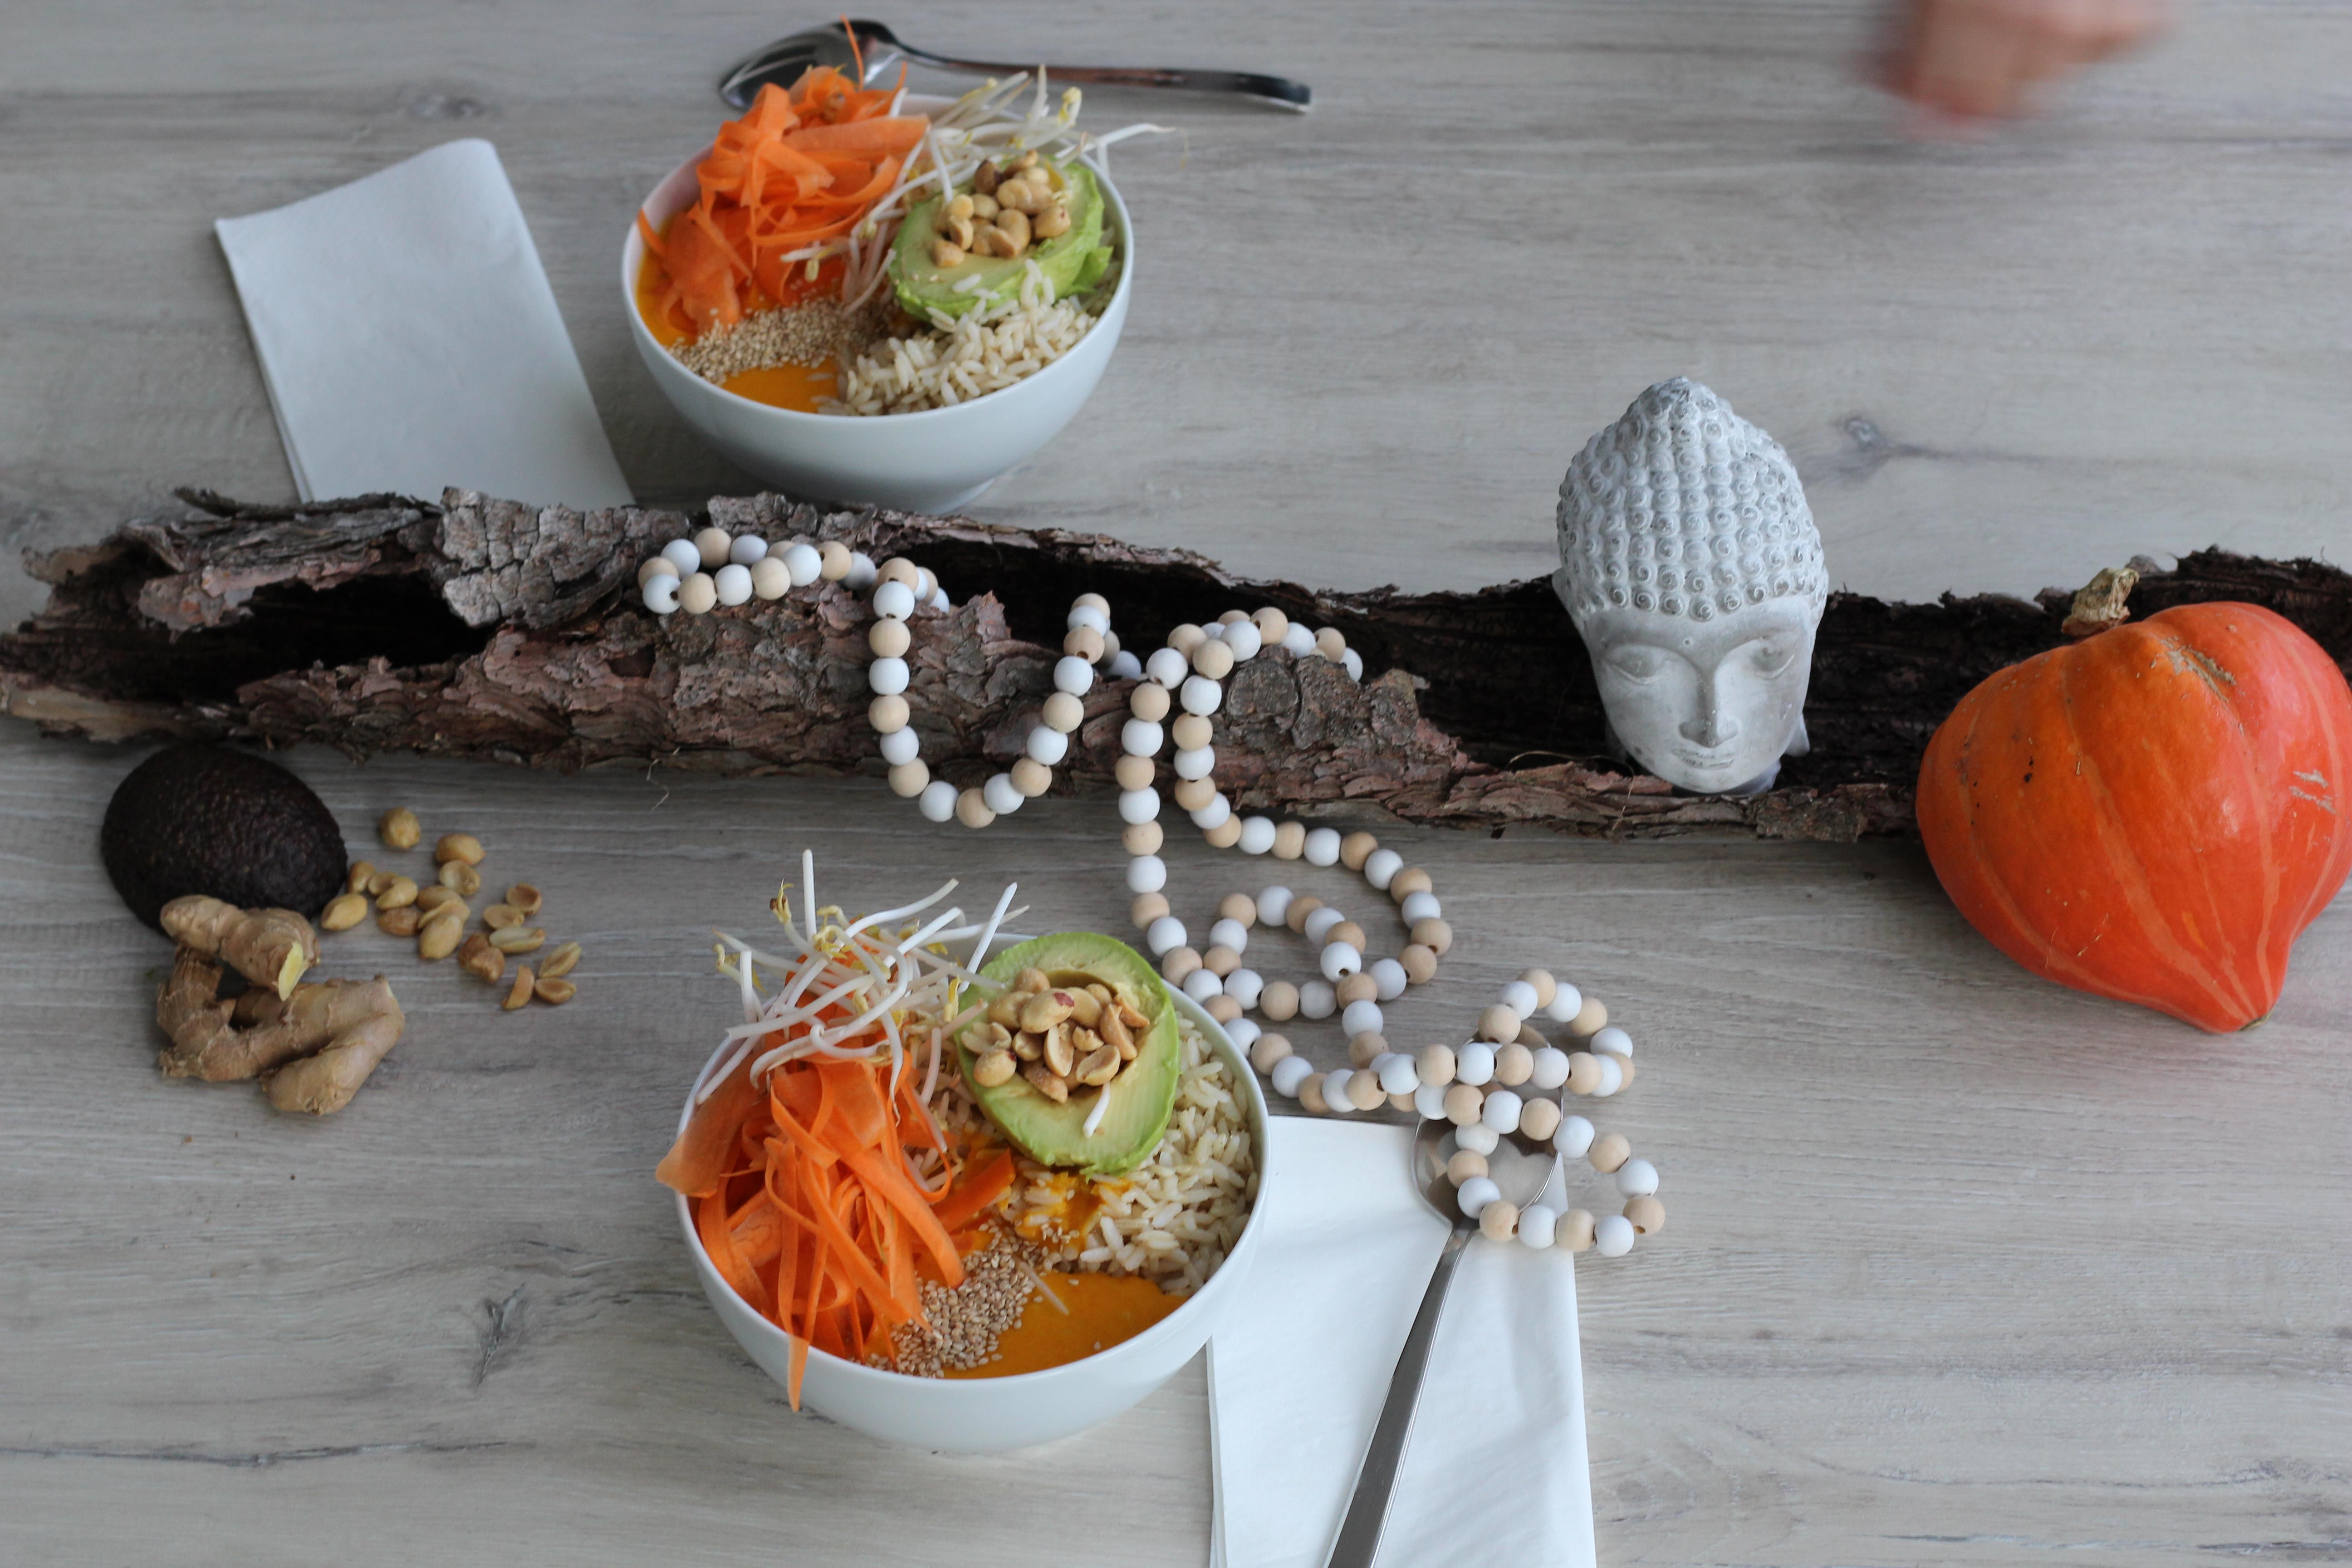 buddha-bowl-dein-homespa-ingwer-kuerbis-sauce%e2%99%a5-%e2%99%a5